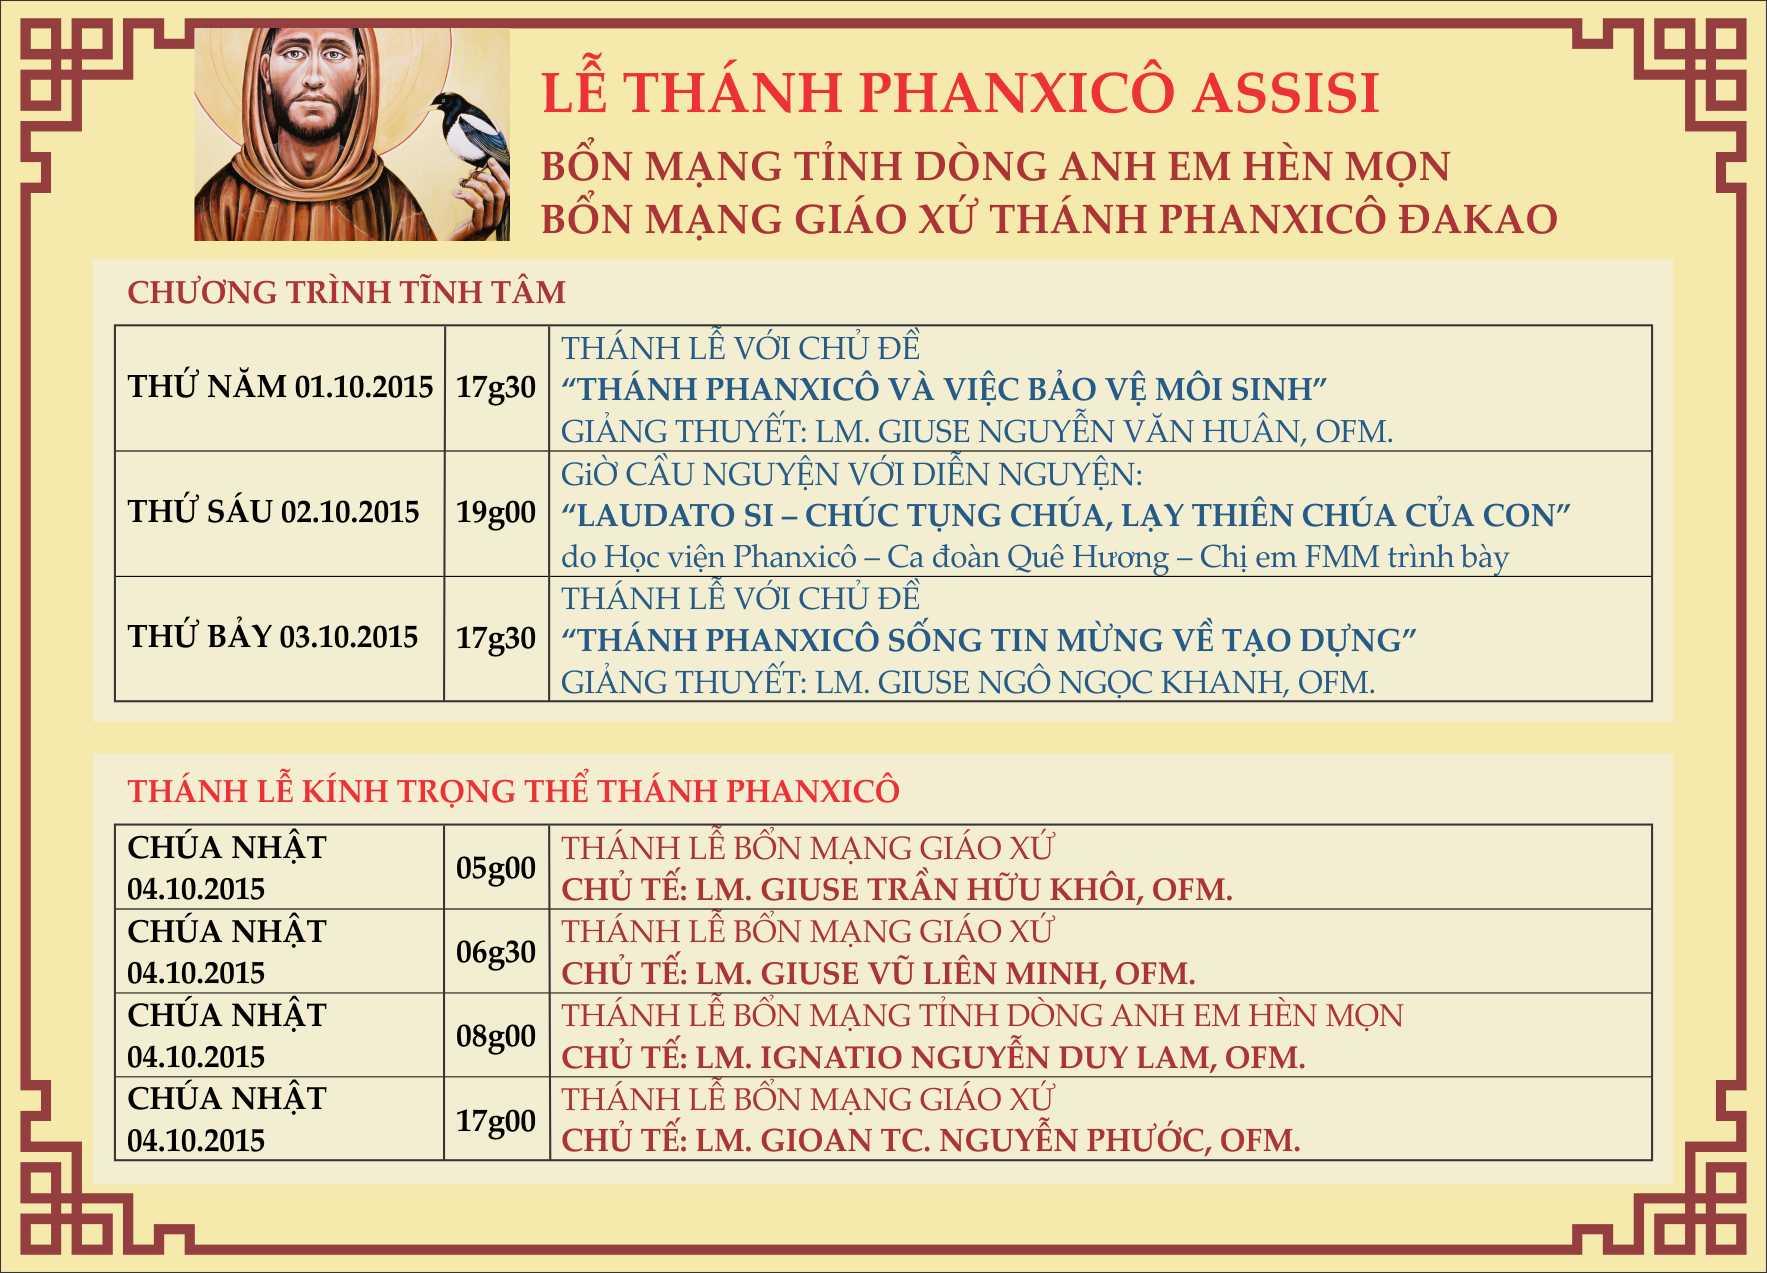 LE THANH PHANXICO ASSISI 4 10 2015